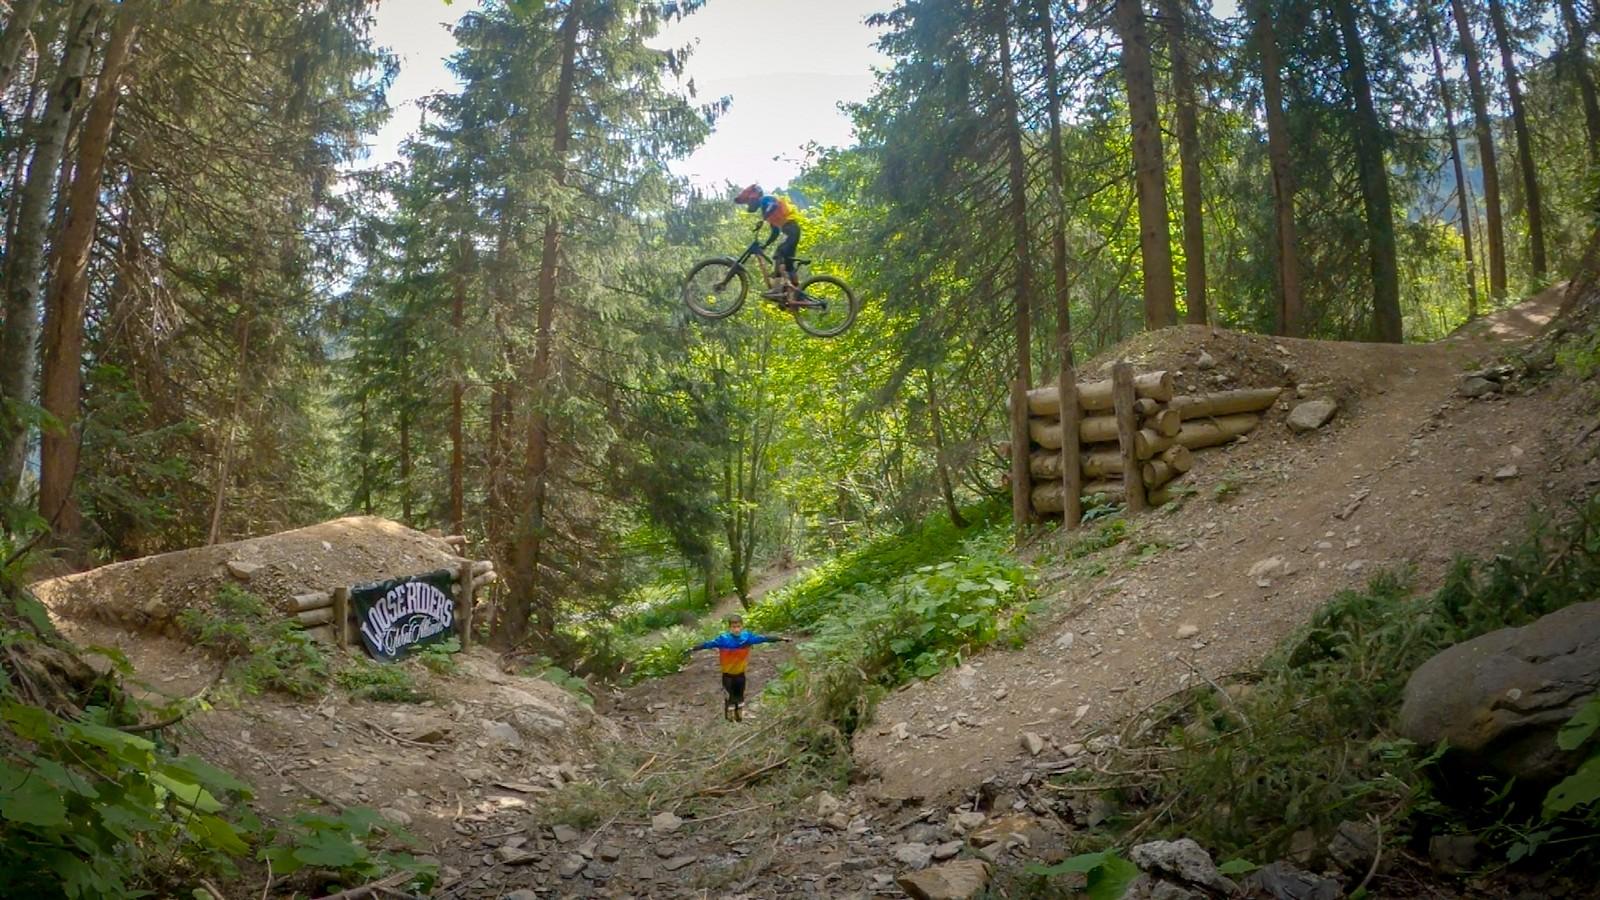 13 year old at Chatel Zougouloukata  - Milan_DH - Mountain Biking Pictures - Vital MTB